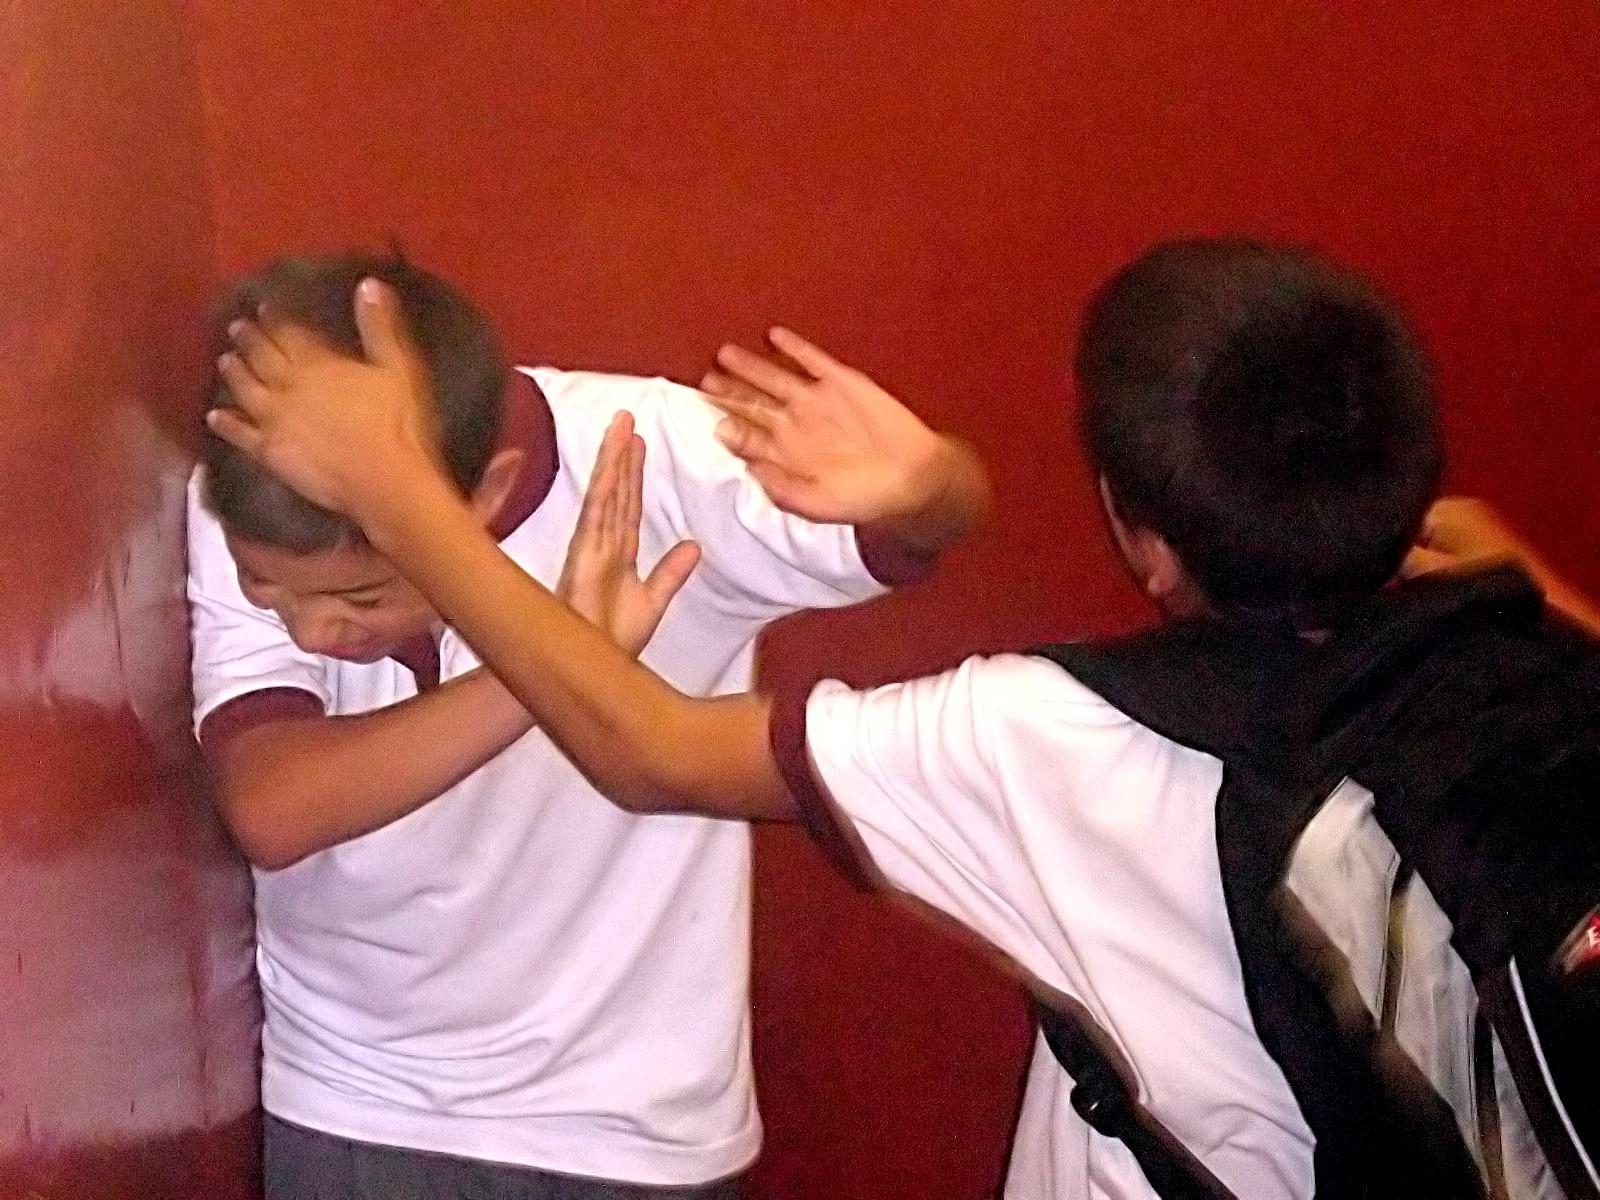 Frases Contra El Bullying Dile No Al Bullying Y Al Acoso